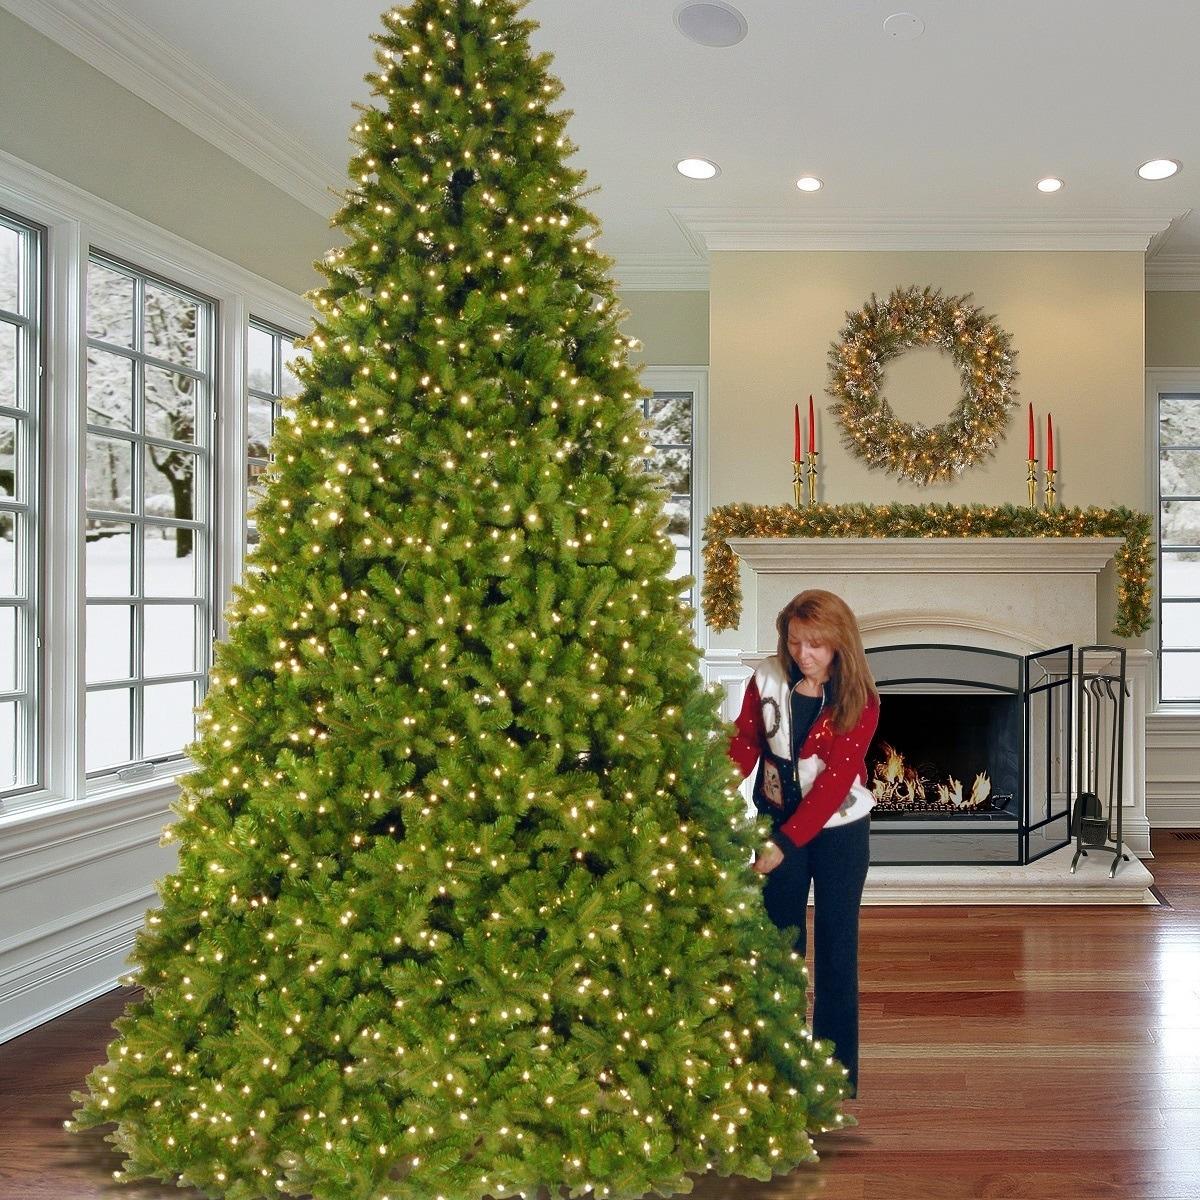 12 Foot Christmas Tree.12 Foot Downswept Douglas Fir Tree With Clear Lights